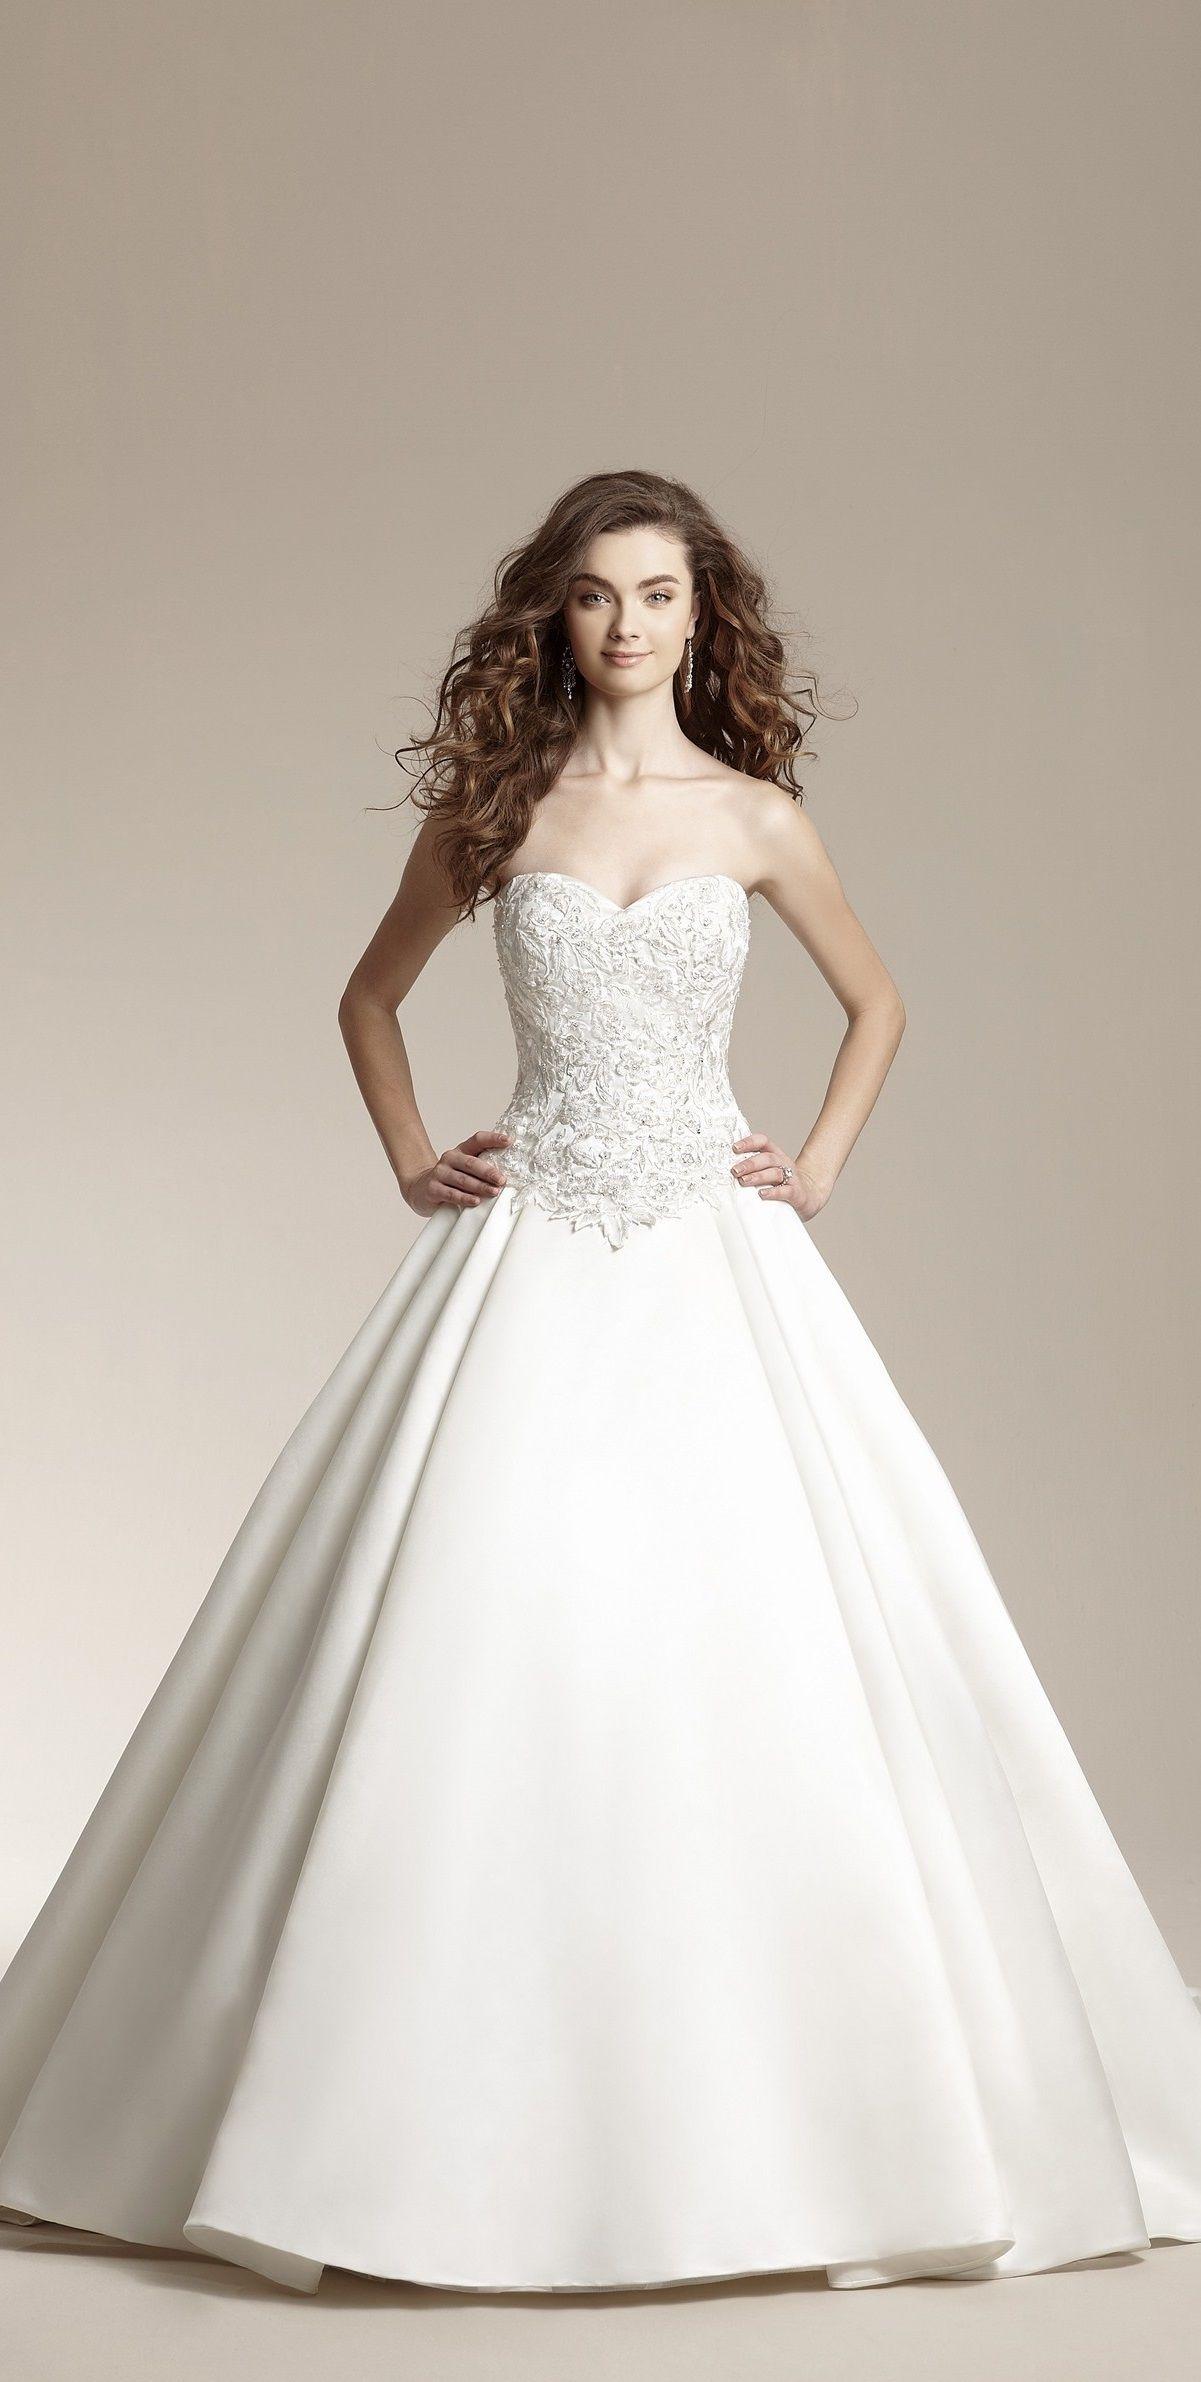 Princess Wedding Dress From Jasmine Bridal Wedding Dresses Disney Princess Wedding Dresses Bridal Dresses [ 2382 x 1201 Pixel ]